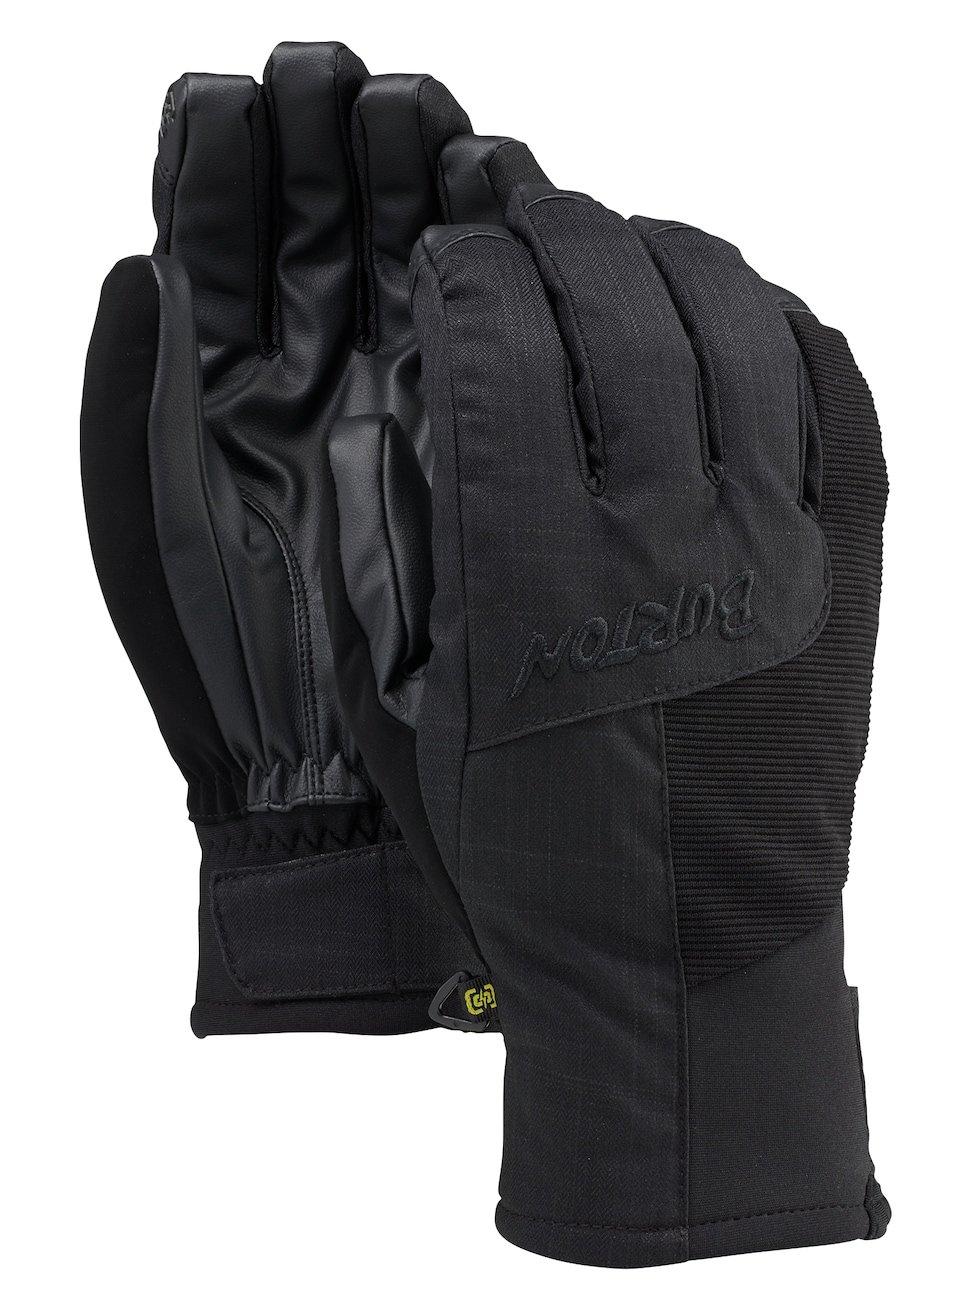 Burton Herren Handschuhe Mb Empire Glove